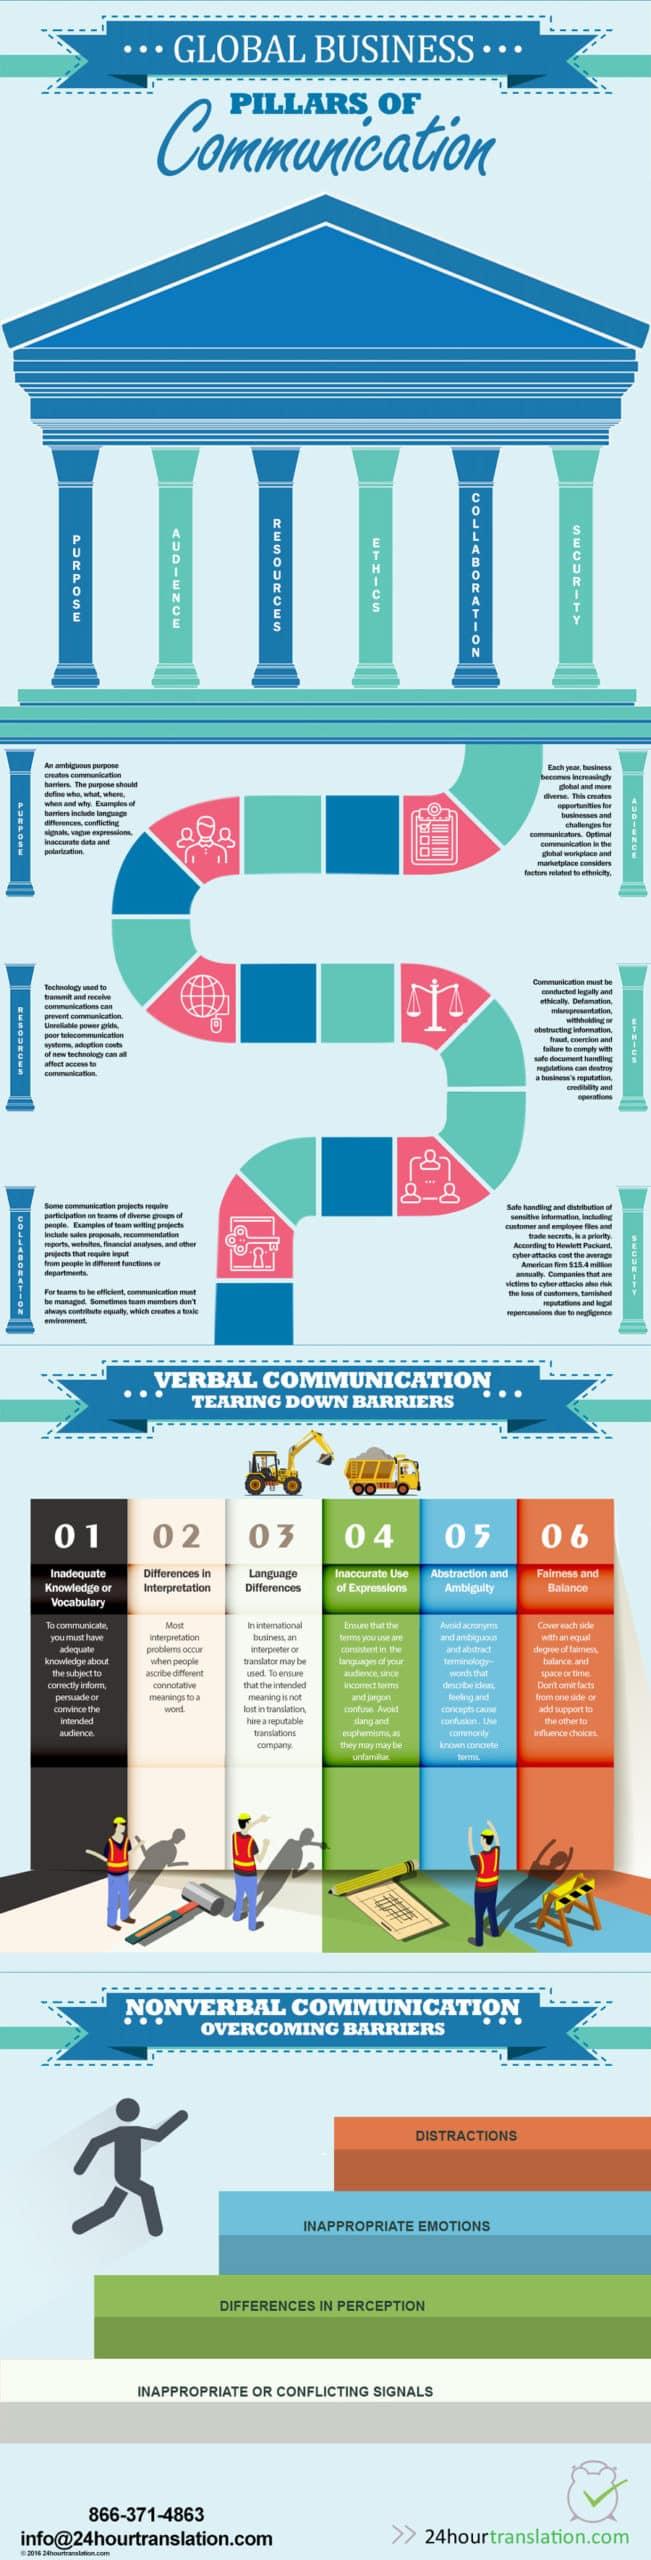 6 Pillars of Communication